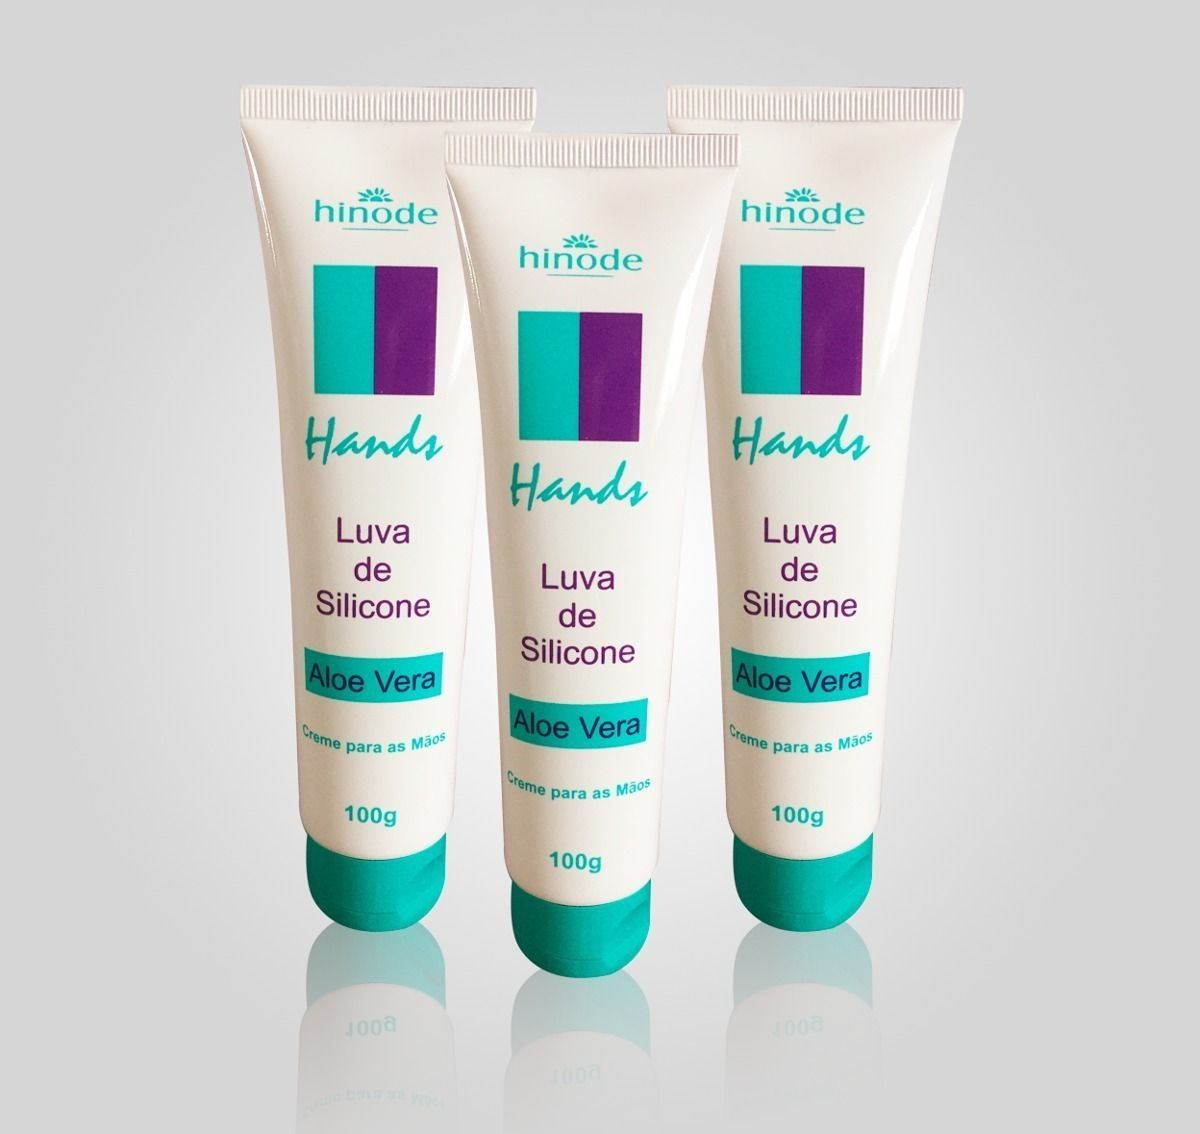 hands luvas de silicone - creme para mãos hinode - cosméticos hinode